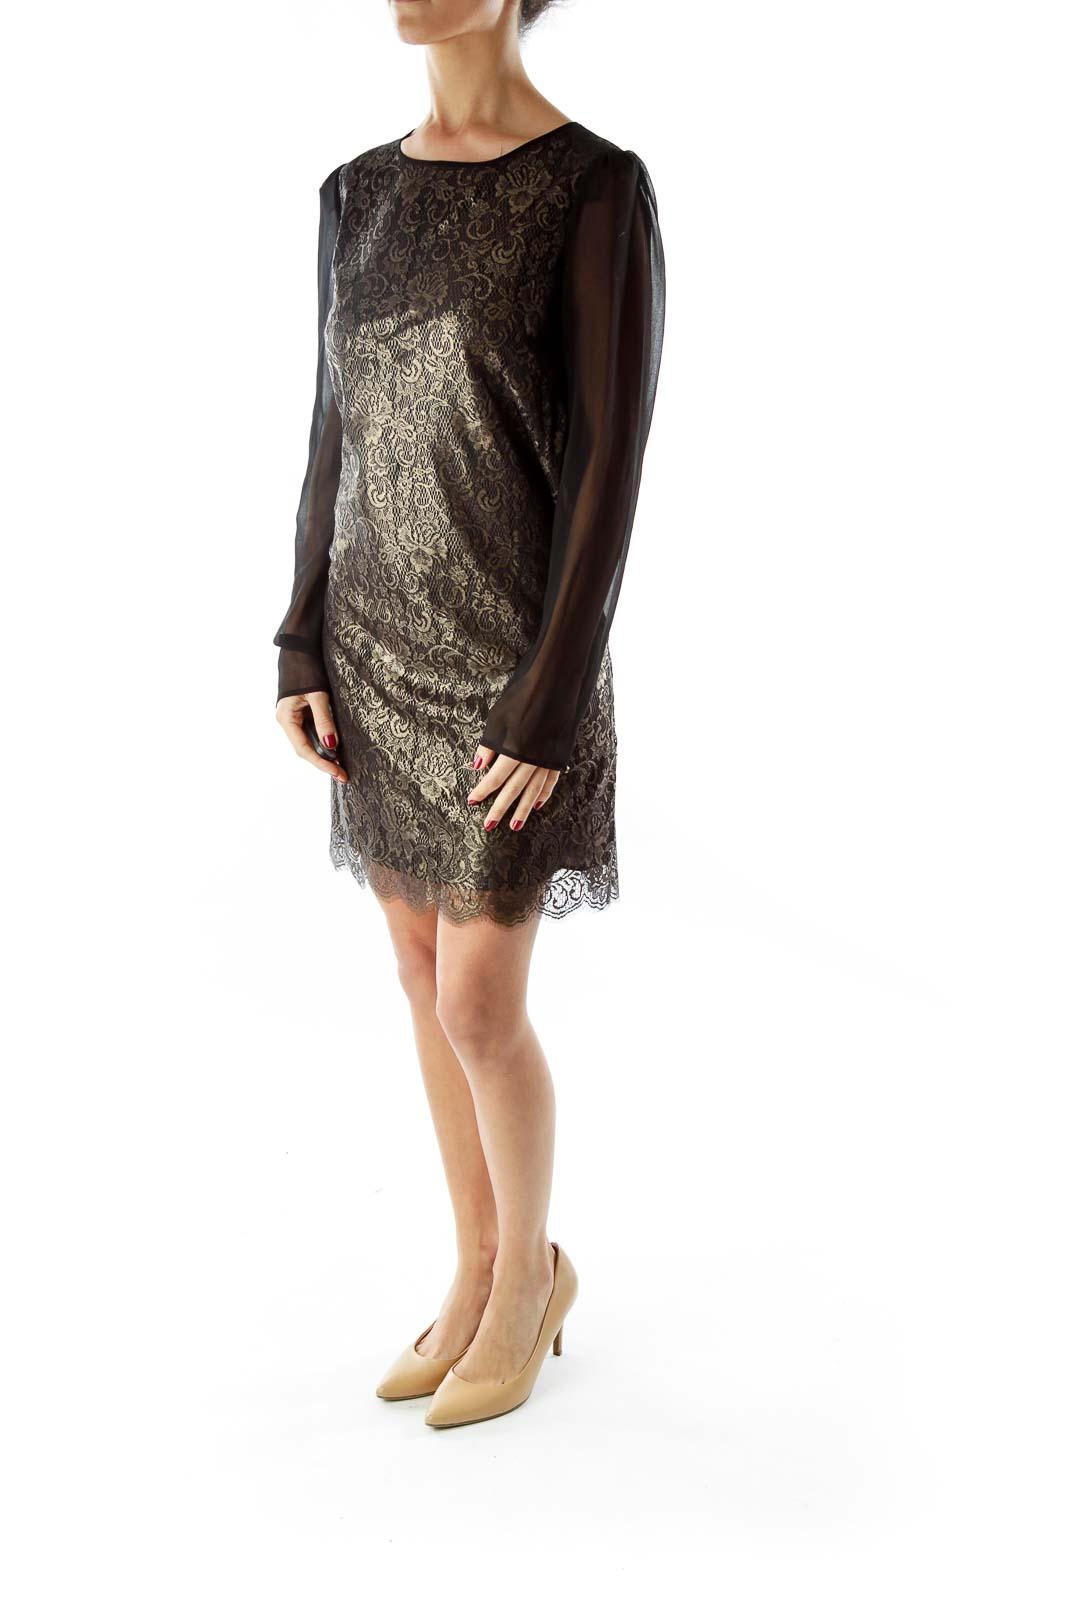 Black Gold Lace Cocktail Dress